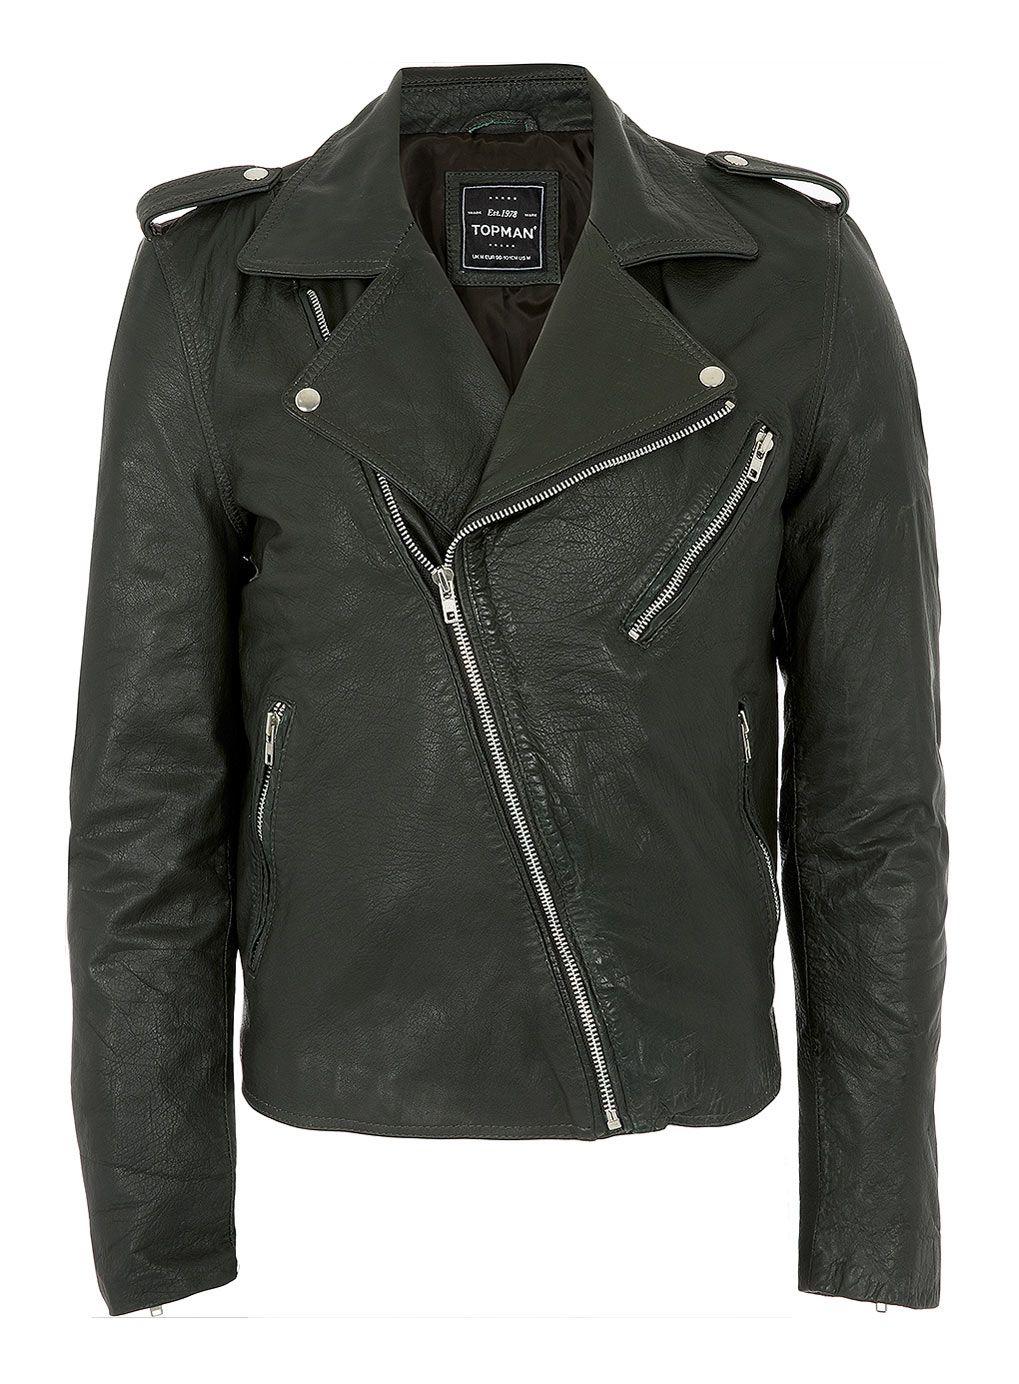 Wool cashmere flannel jacket  My biker jacket  Clothes  Pinterest  Leather biker jackets